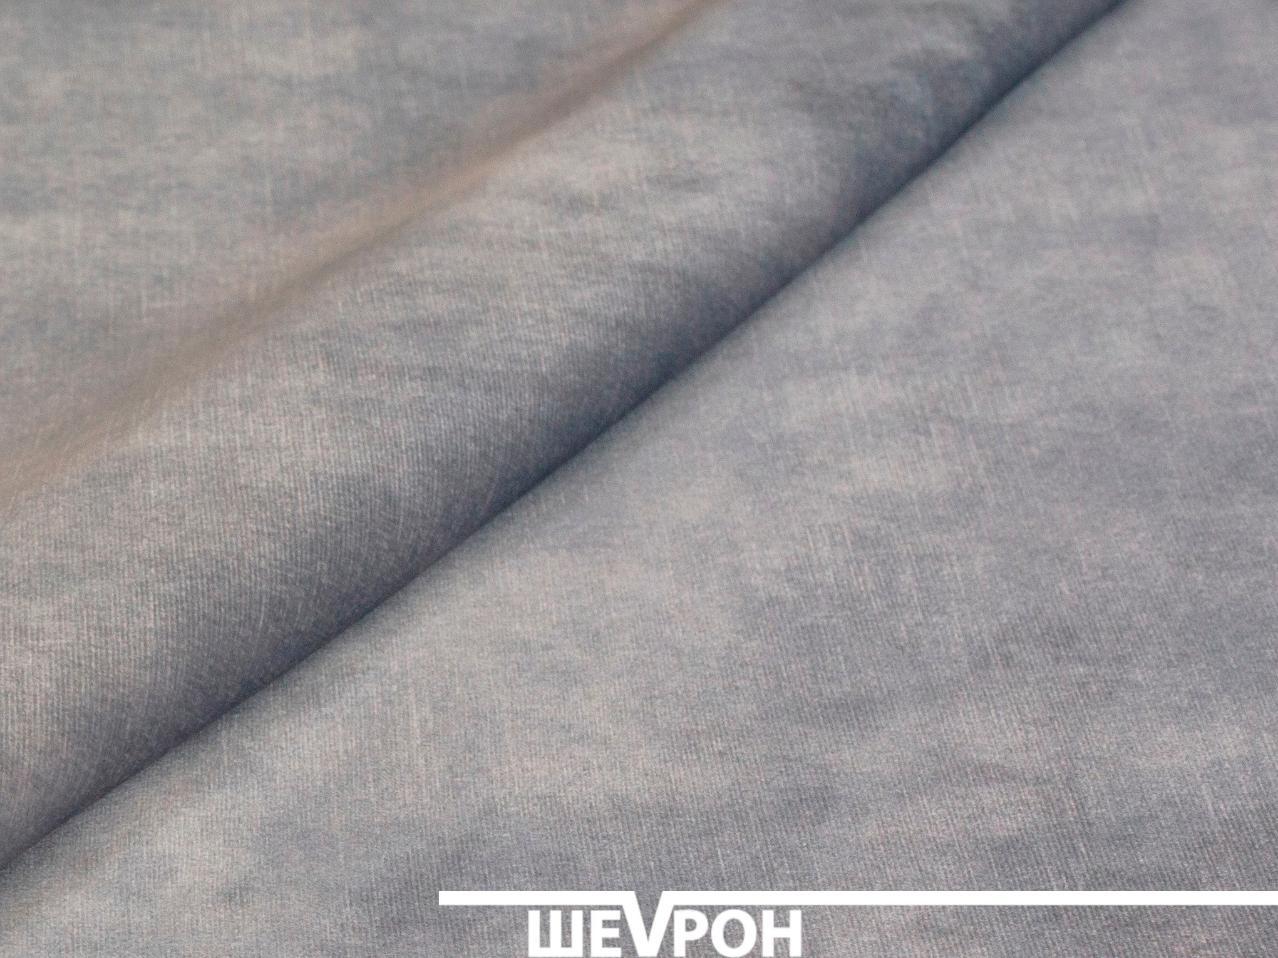 картинка Ткань CRAFT 18 от магазина Шеврон